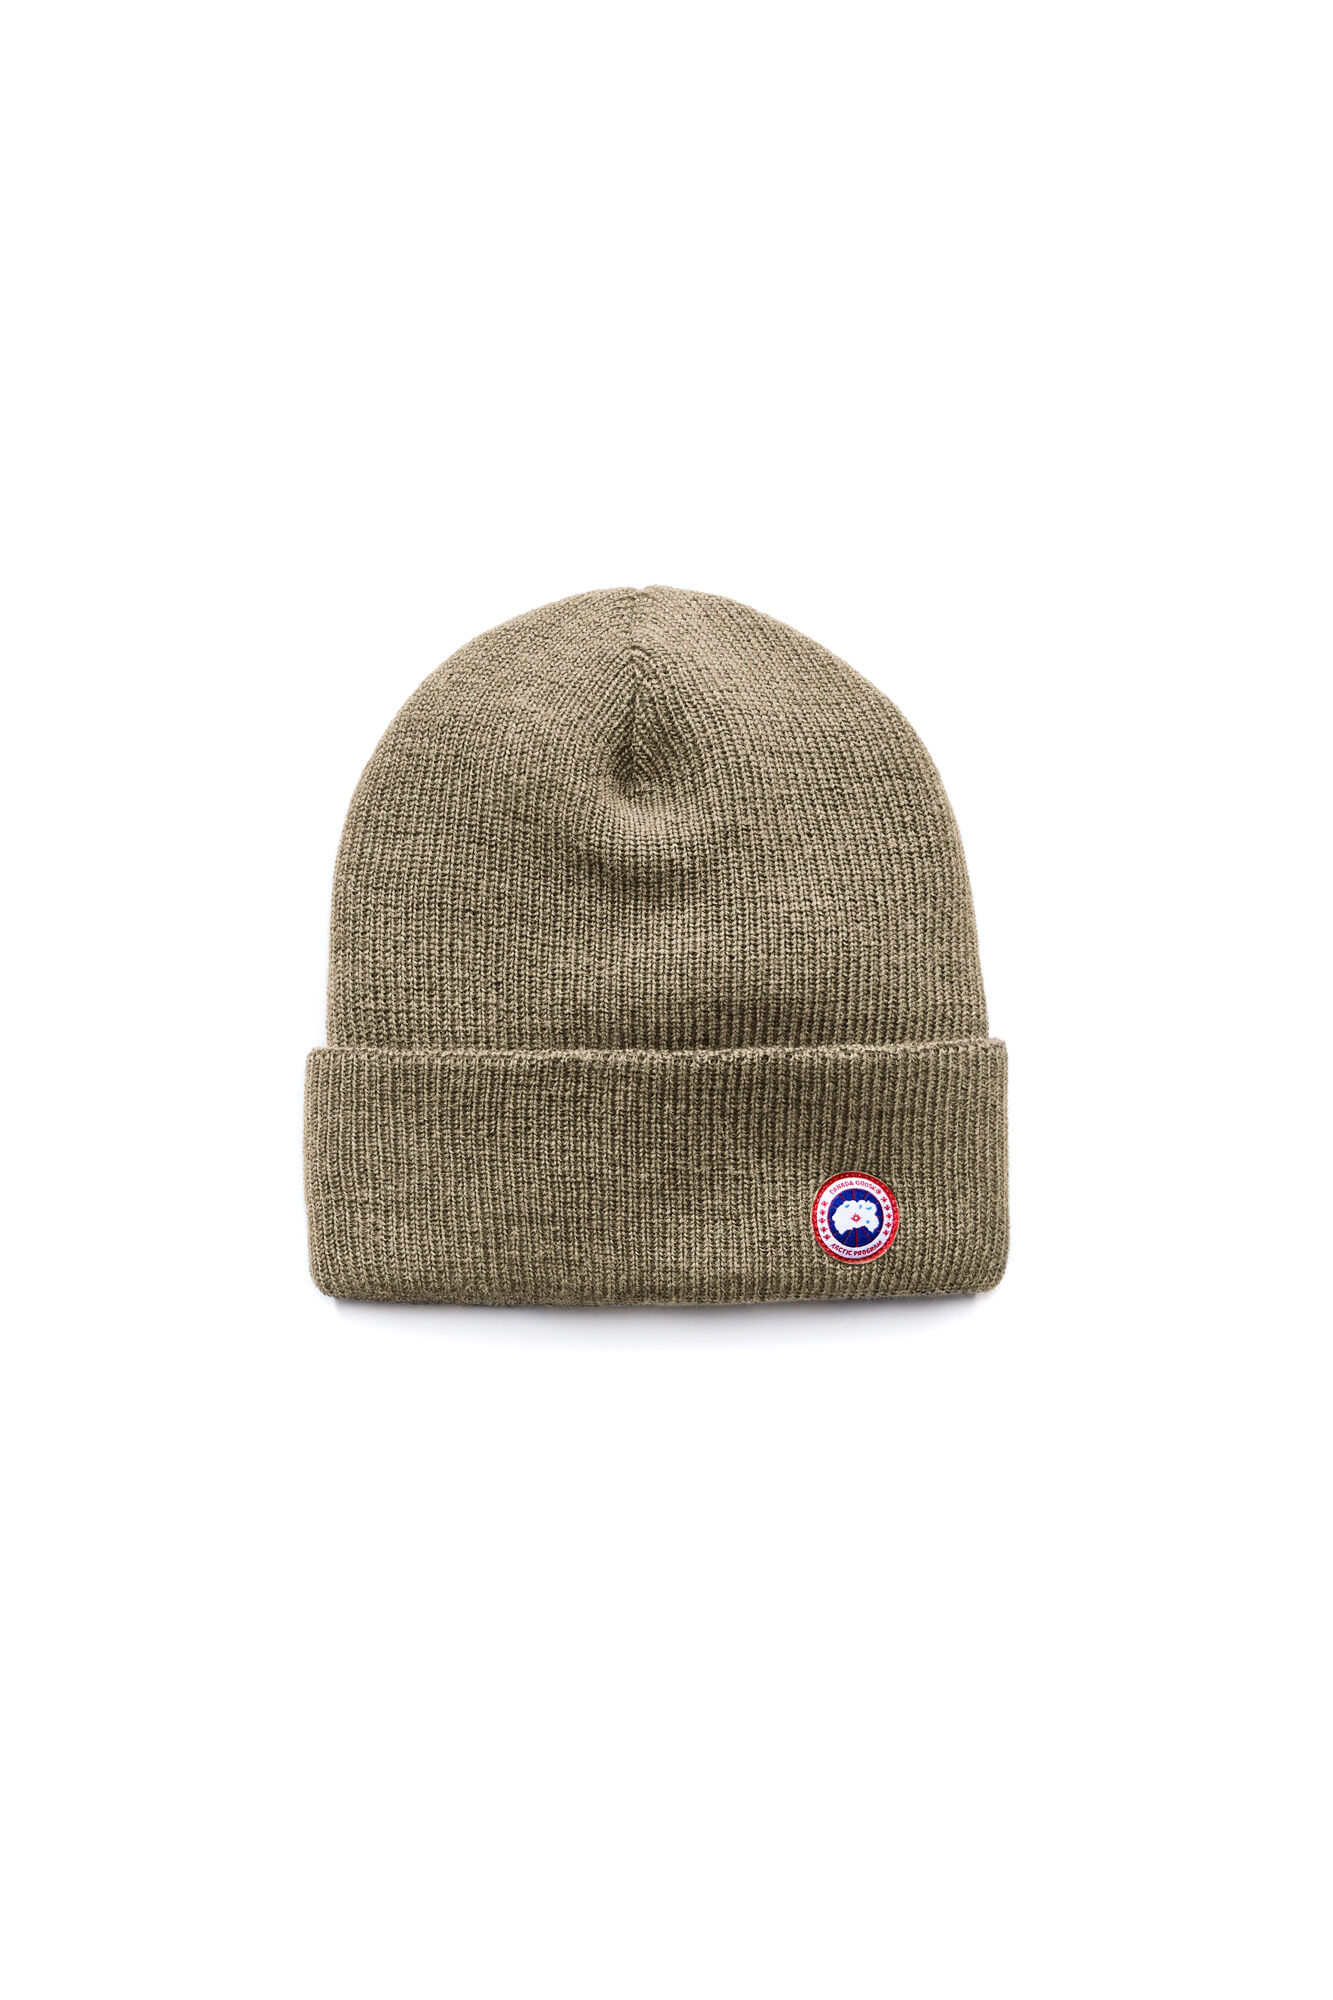 Canada Goose chilliwack parka online authentic - Merino Wool Watch Cap | Canada Goose?